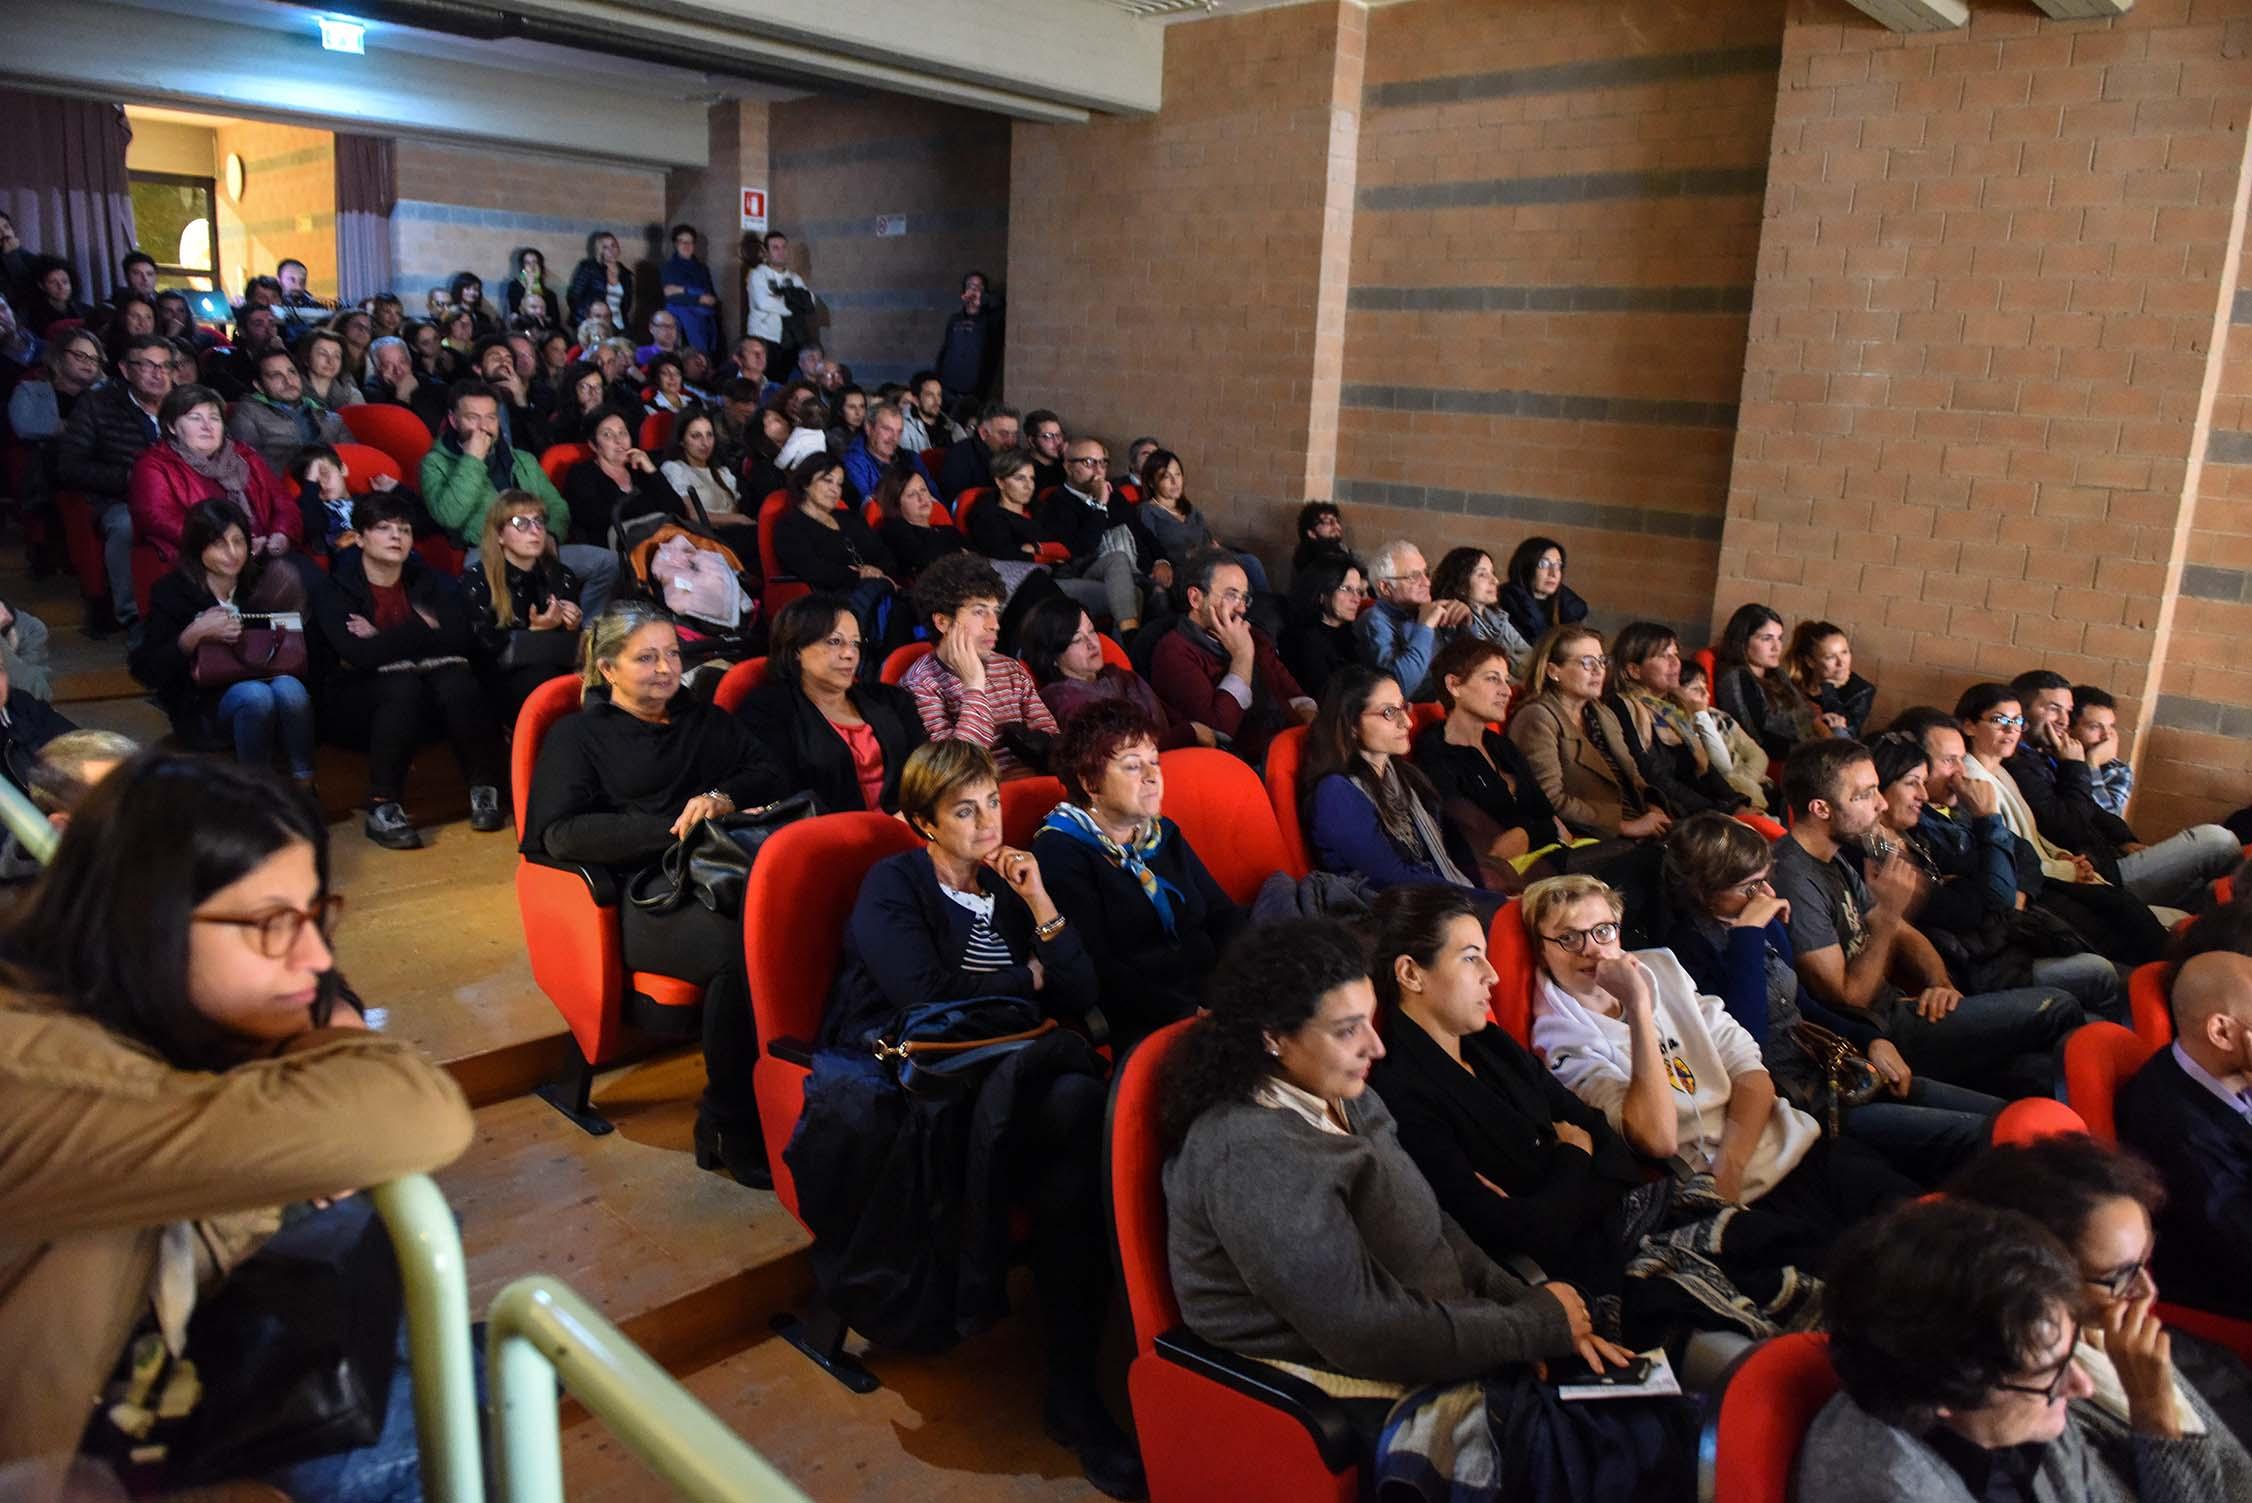 piero-massimo-macchini-auditorium-santelpidio-a-mare-1